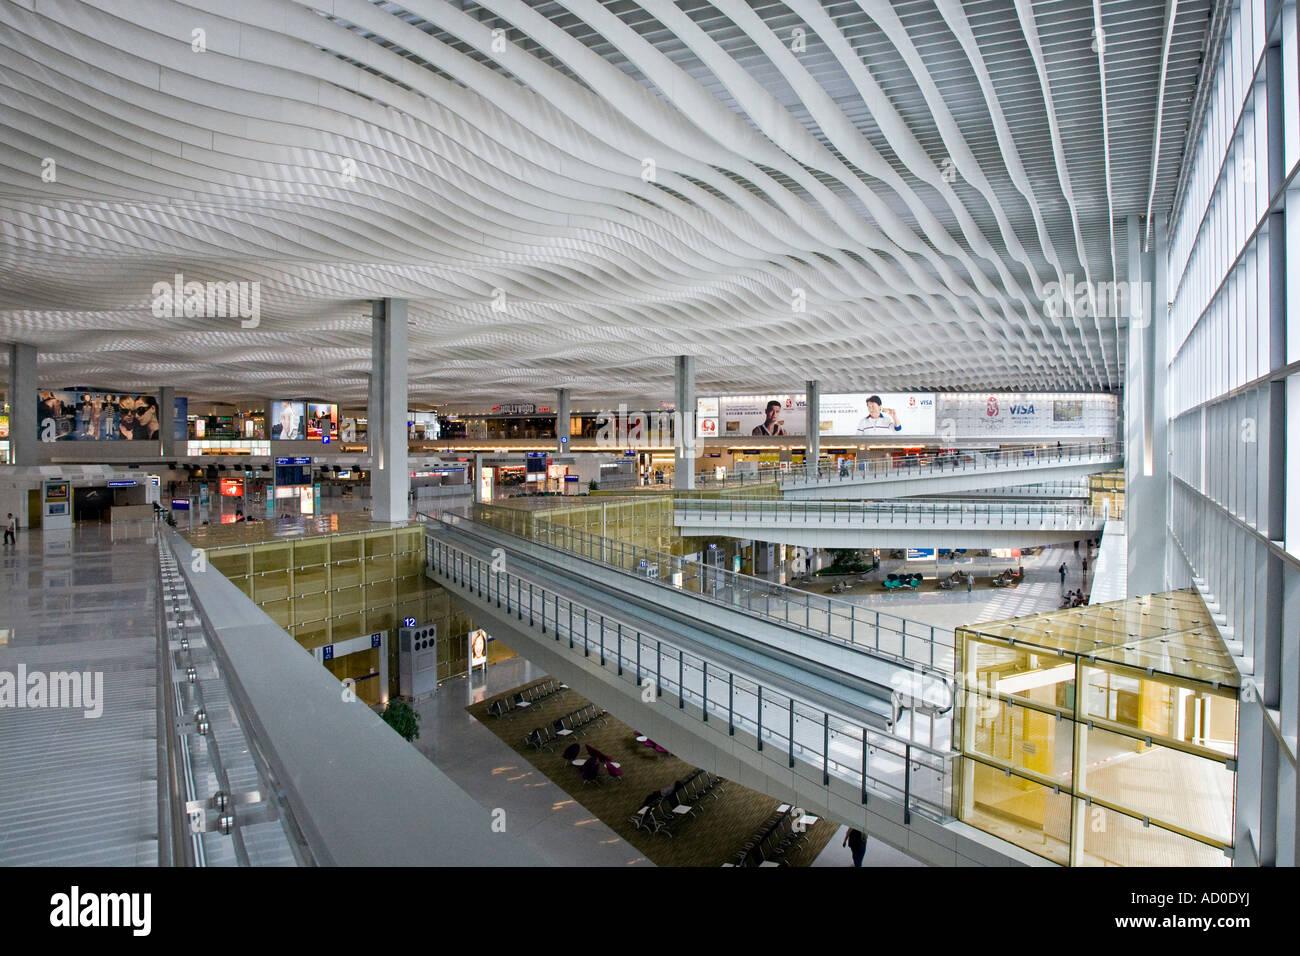 Chek Lap Kok airport Terminal 2 Hong Kong - Stock Image